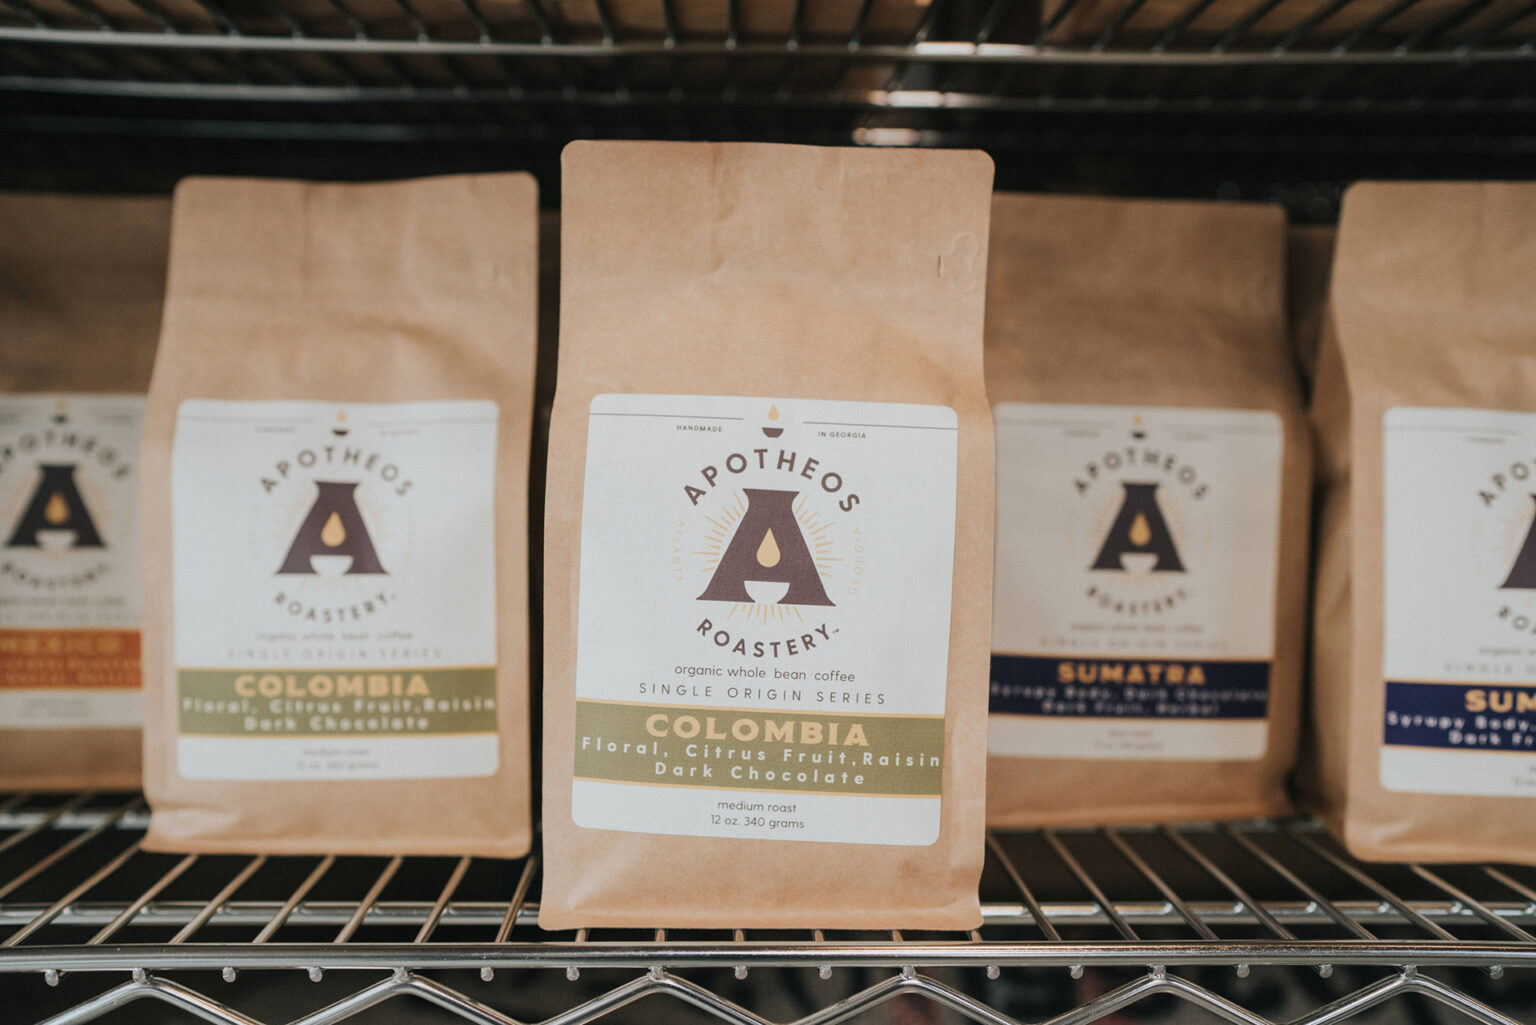 Apotheos Coffee Roastery branding whole bean coffee packaging design